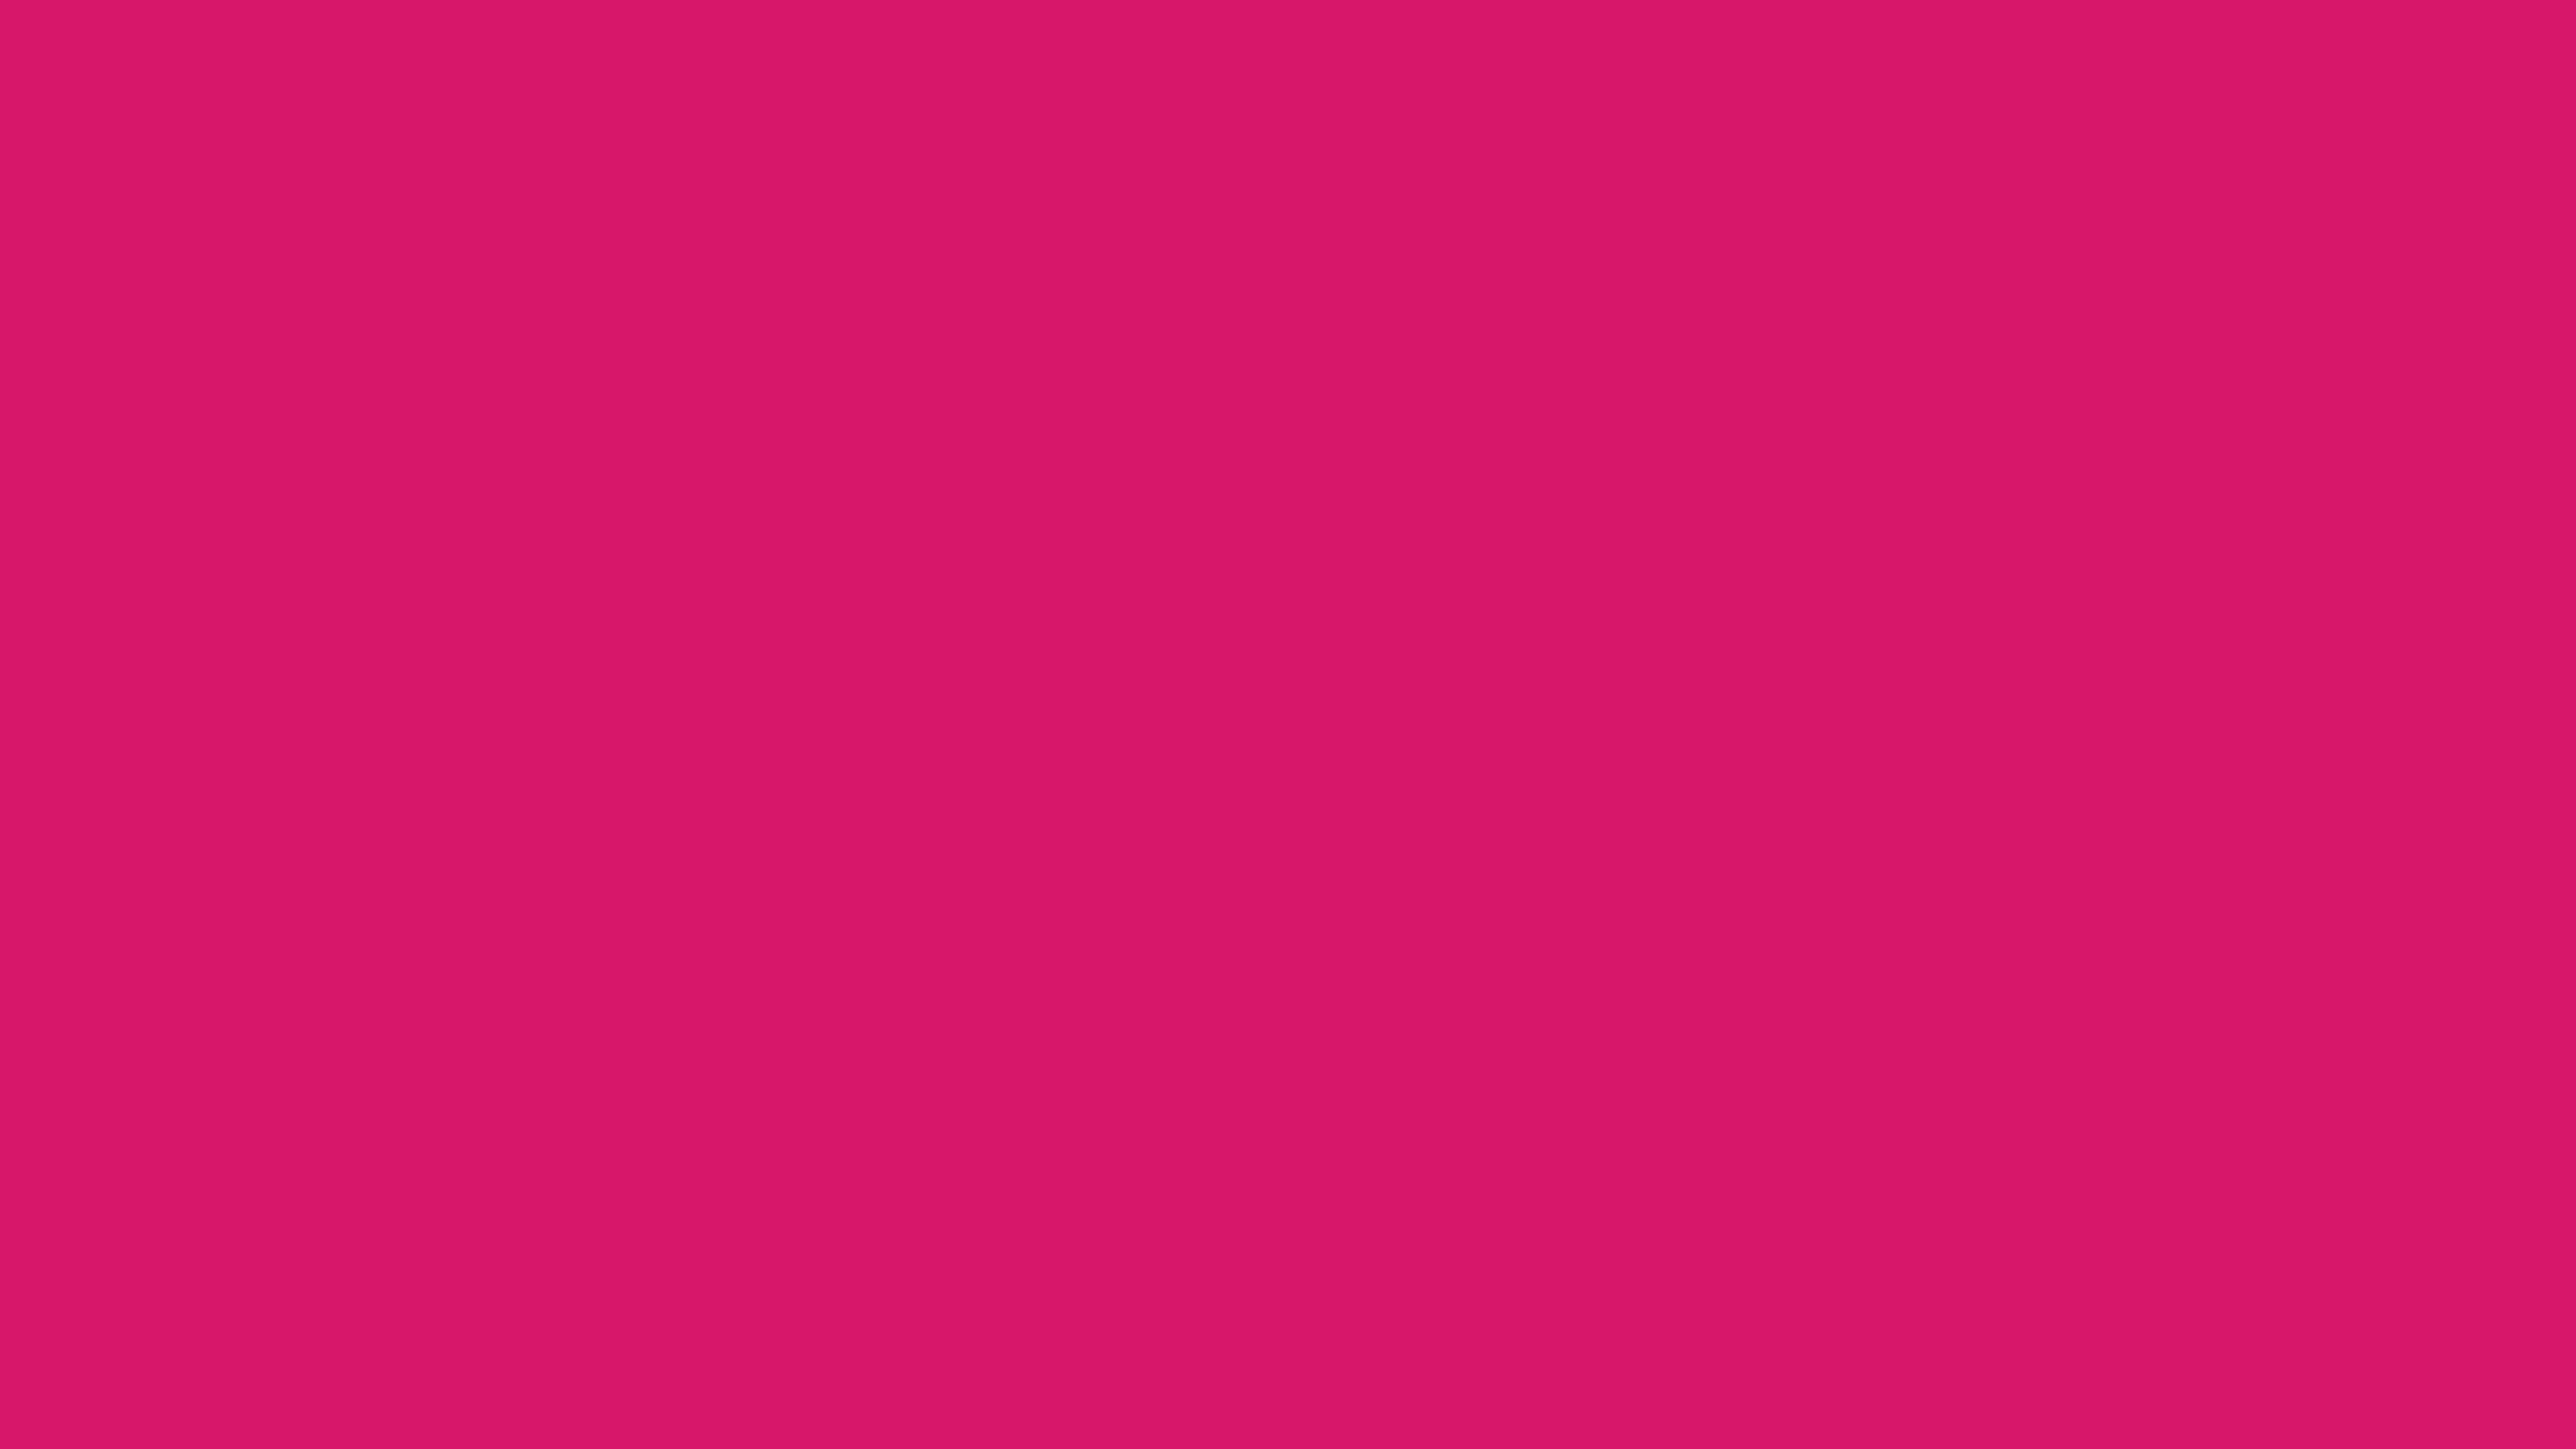 5120x2880 Dogwood Rose Solid Color Background